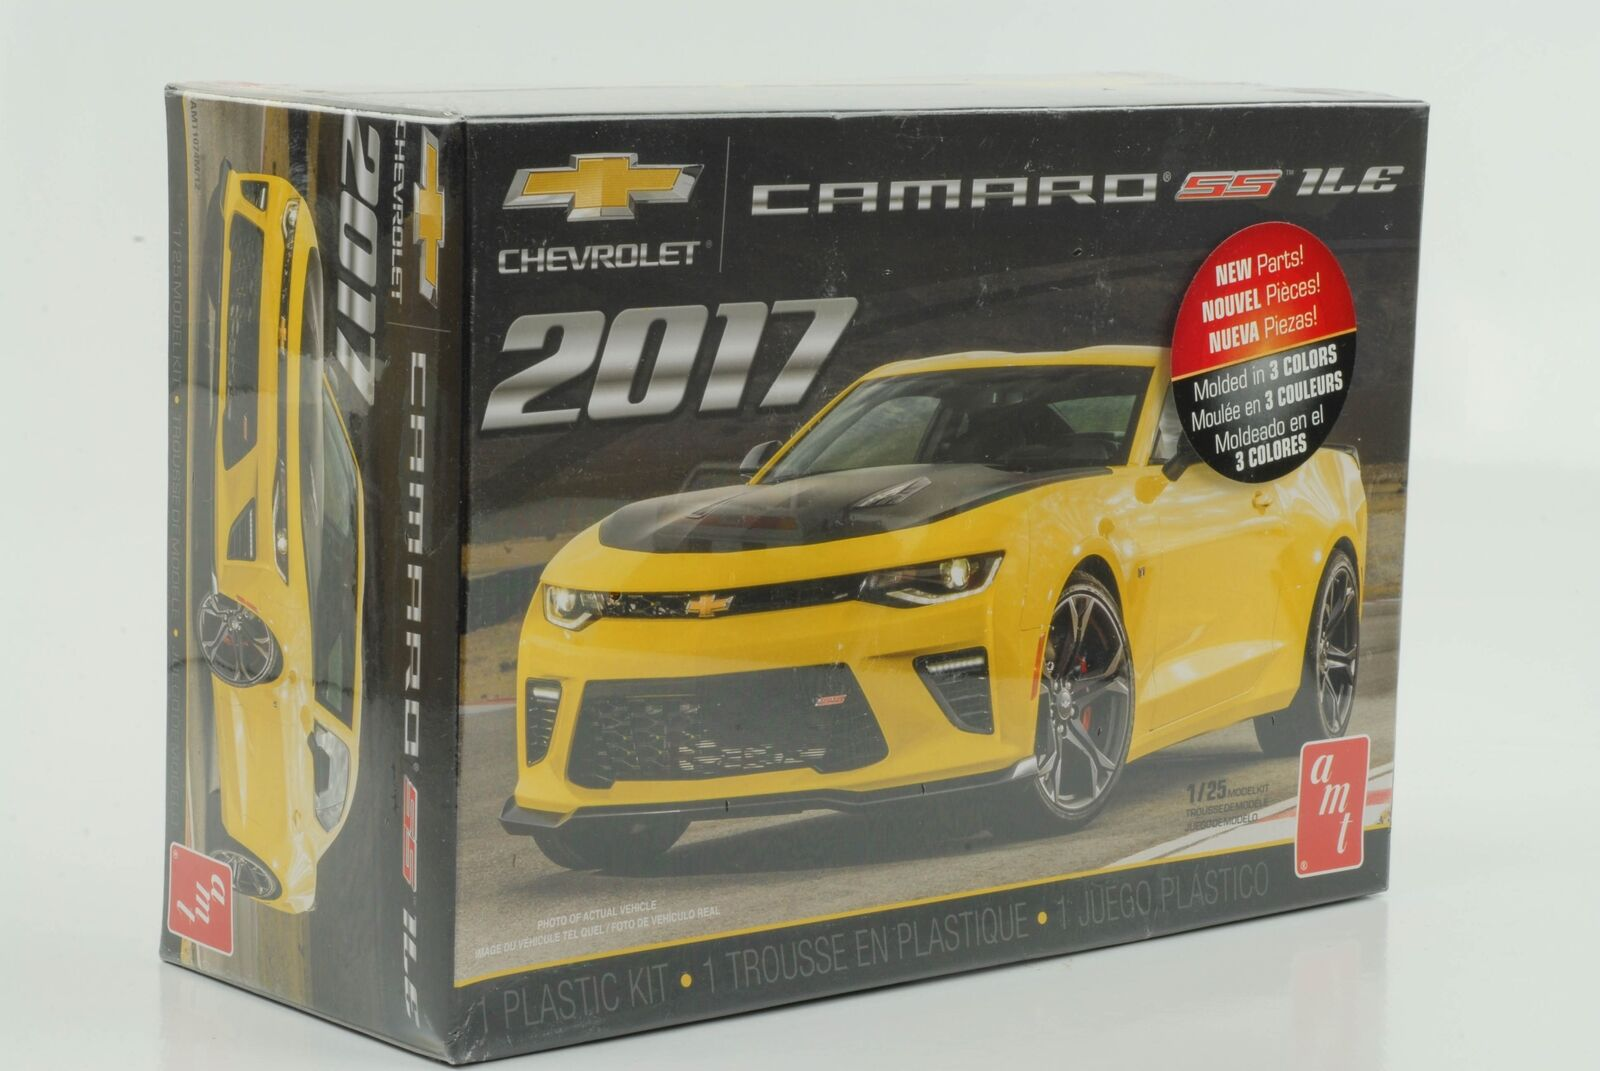 Chevrolet Camaro Ss 2017 1LE Set Kit 1 25 Amt 1074M